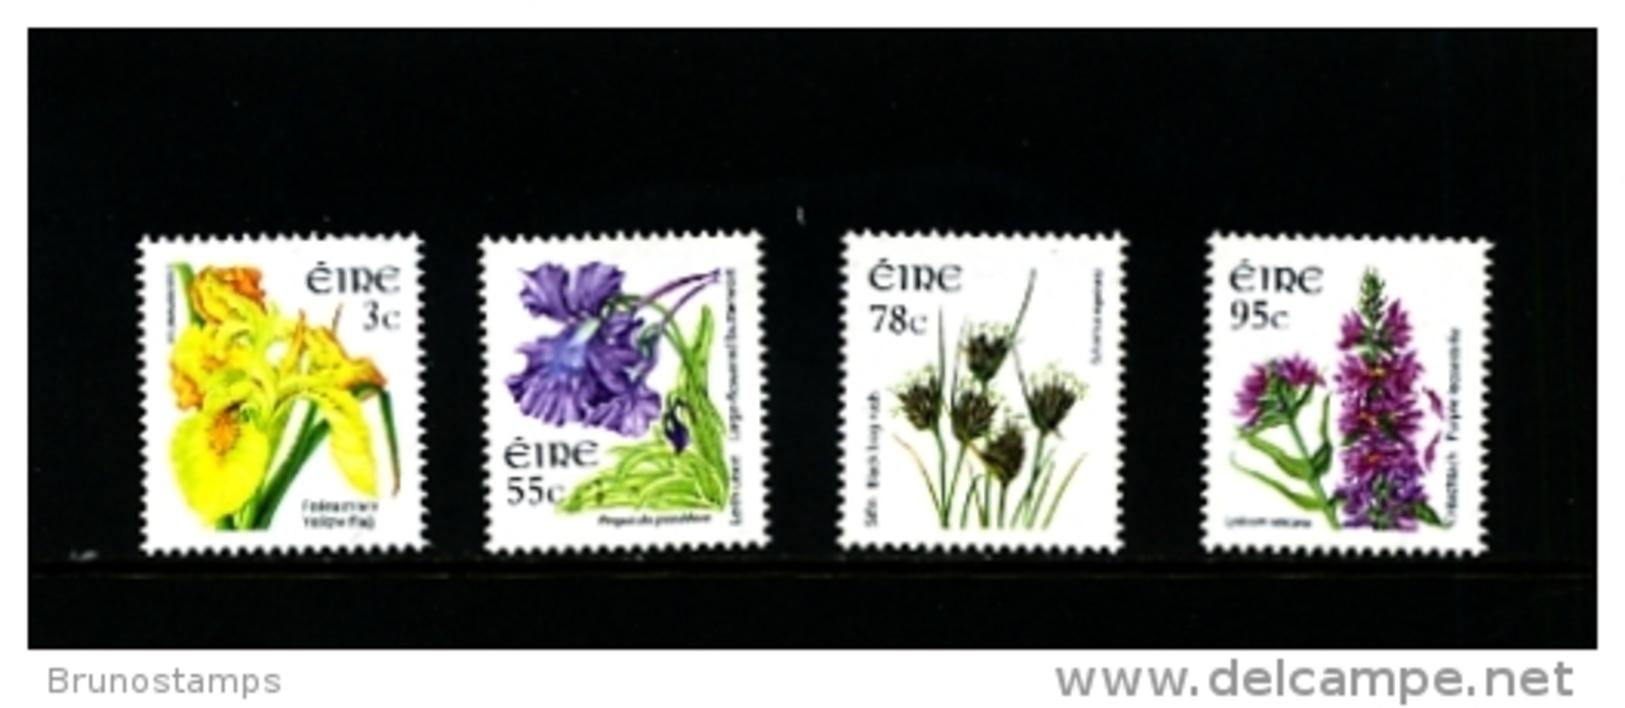 IRELAND/EIRE - 2007  FLOWERS  SET  MINT NH - 1949-... Repubblica D'Irlanda